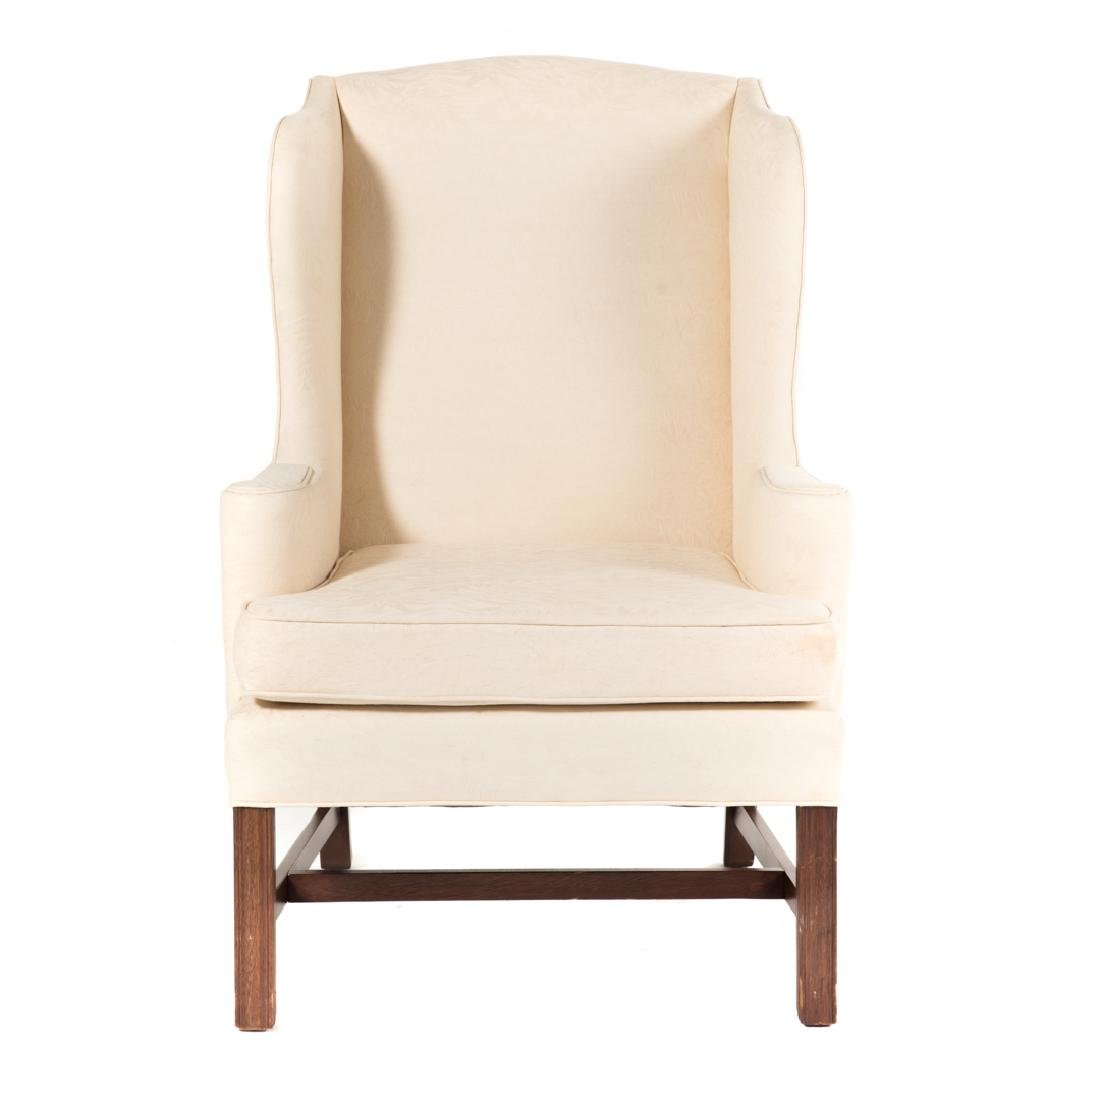 George III style mahogany wing chair